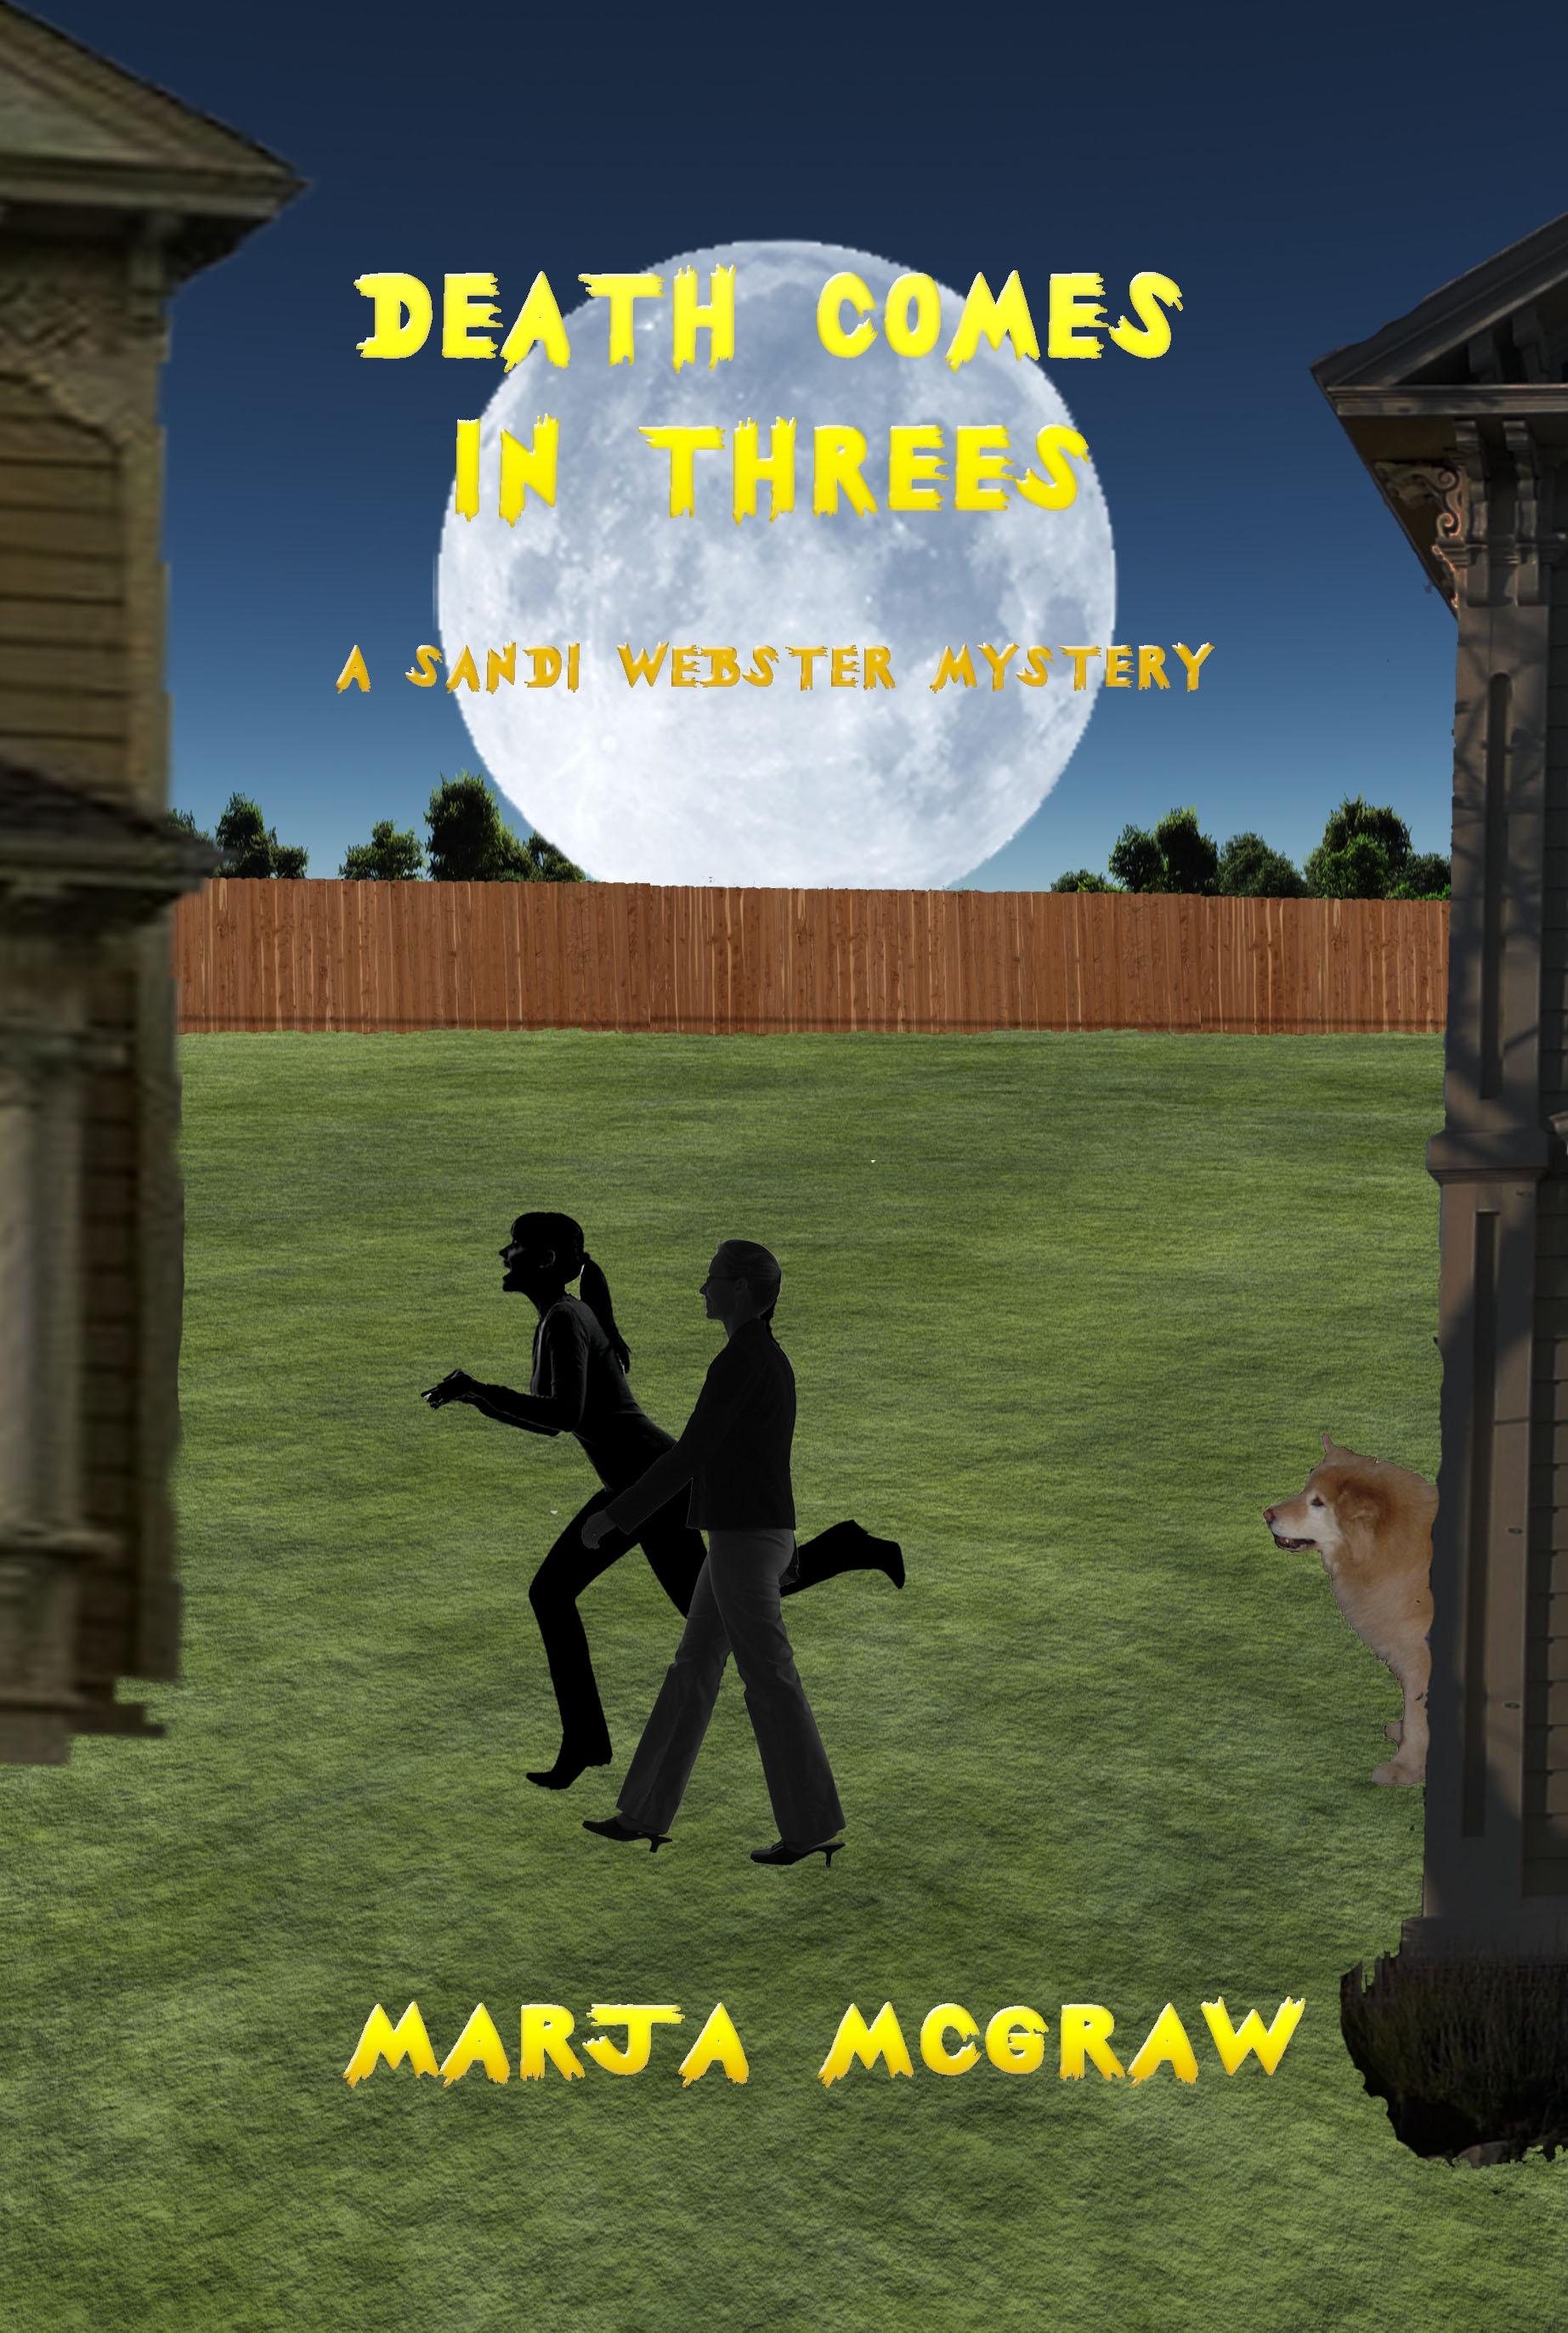 A Well-Kept Family Secret (The Sandi Webster Mysteries Book 1)